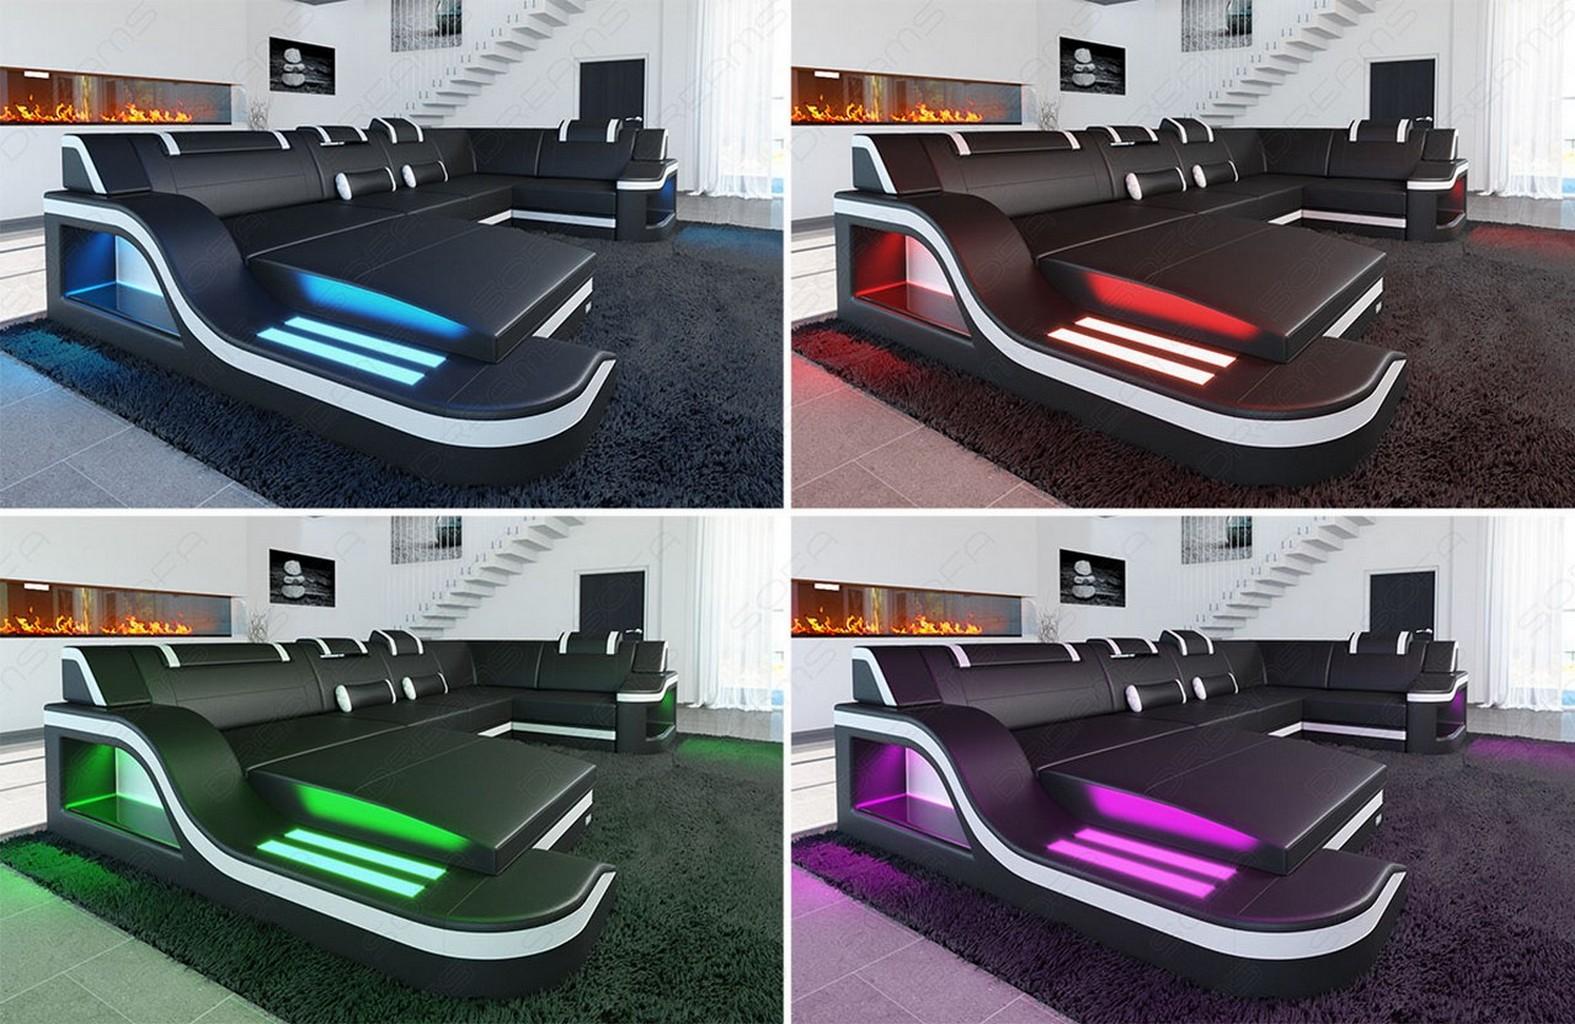 design sectional sofa palermo l shaped leather corner sofa with led lights ebay. Black Bedroom Furniture Sets. Home Design Ideas